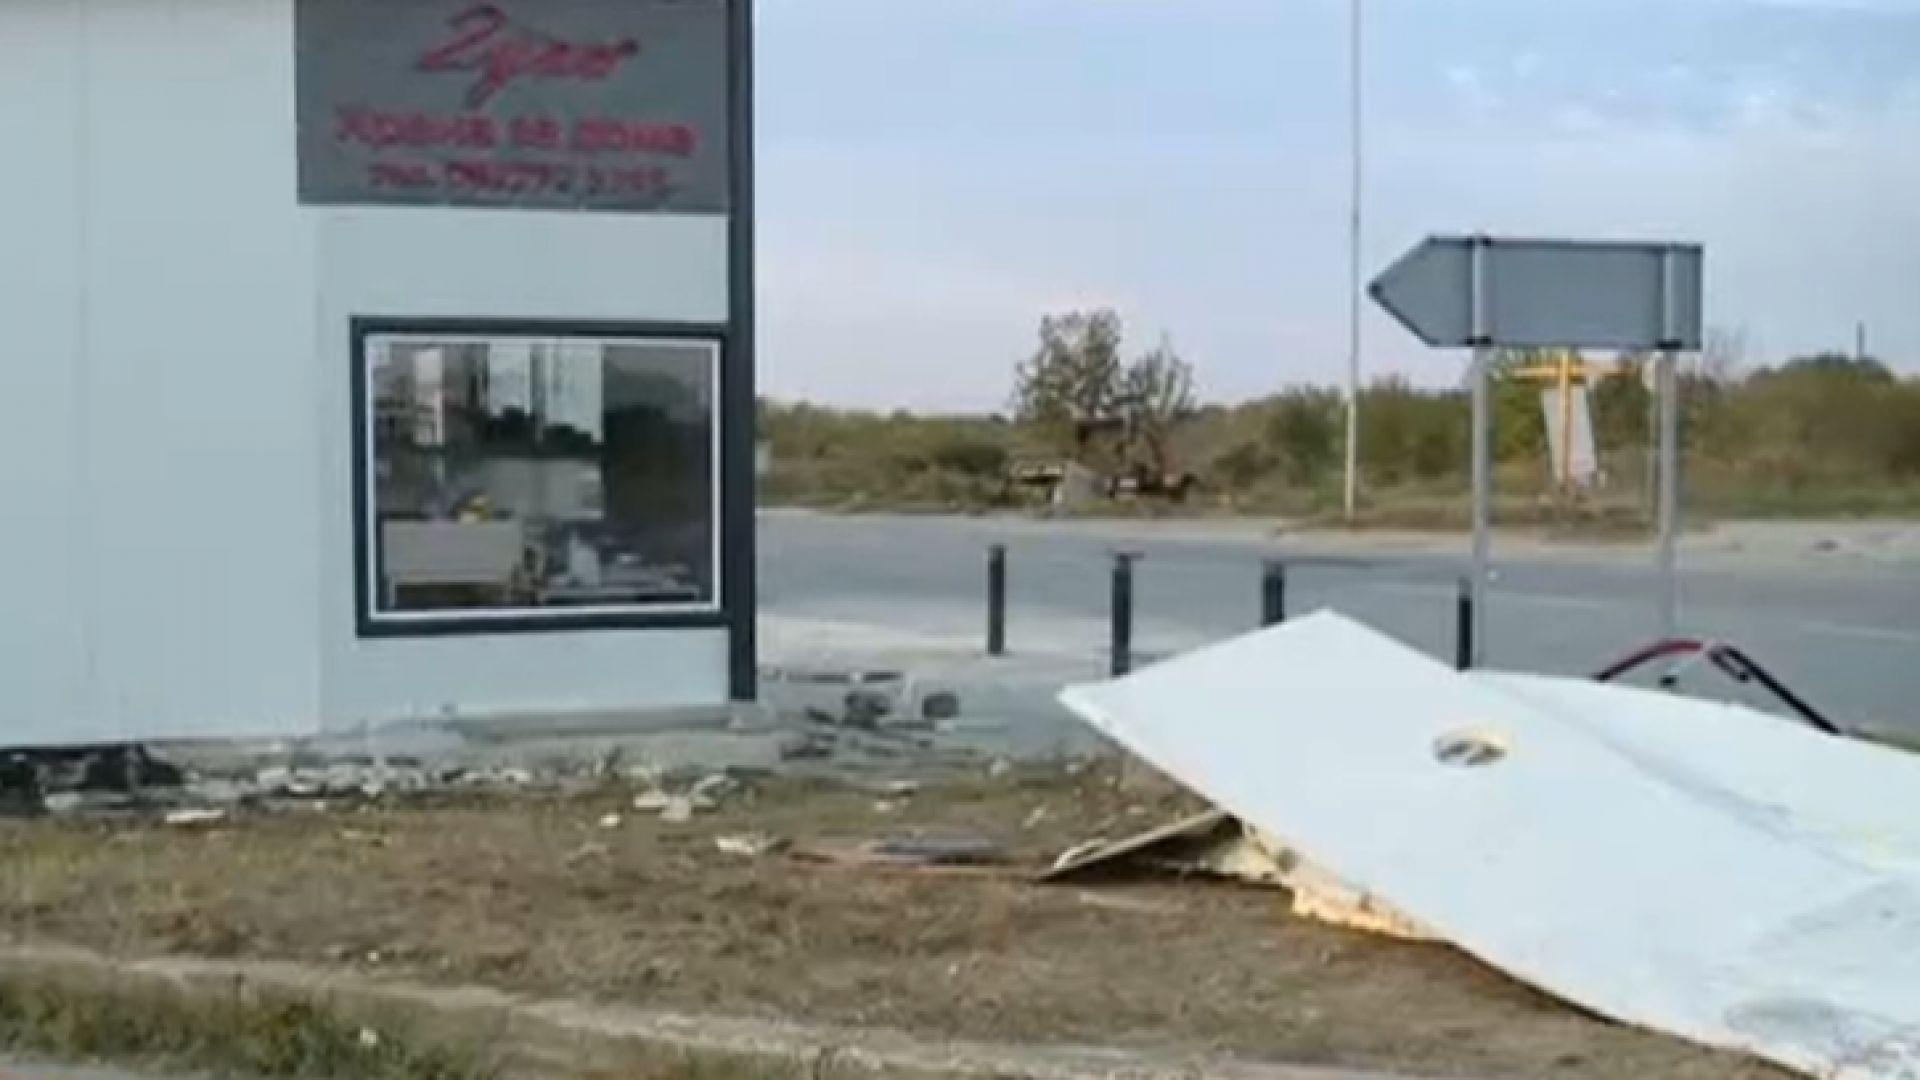 Освободиха шофьора без книжка, който се заби в заведение и рани собственика